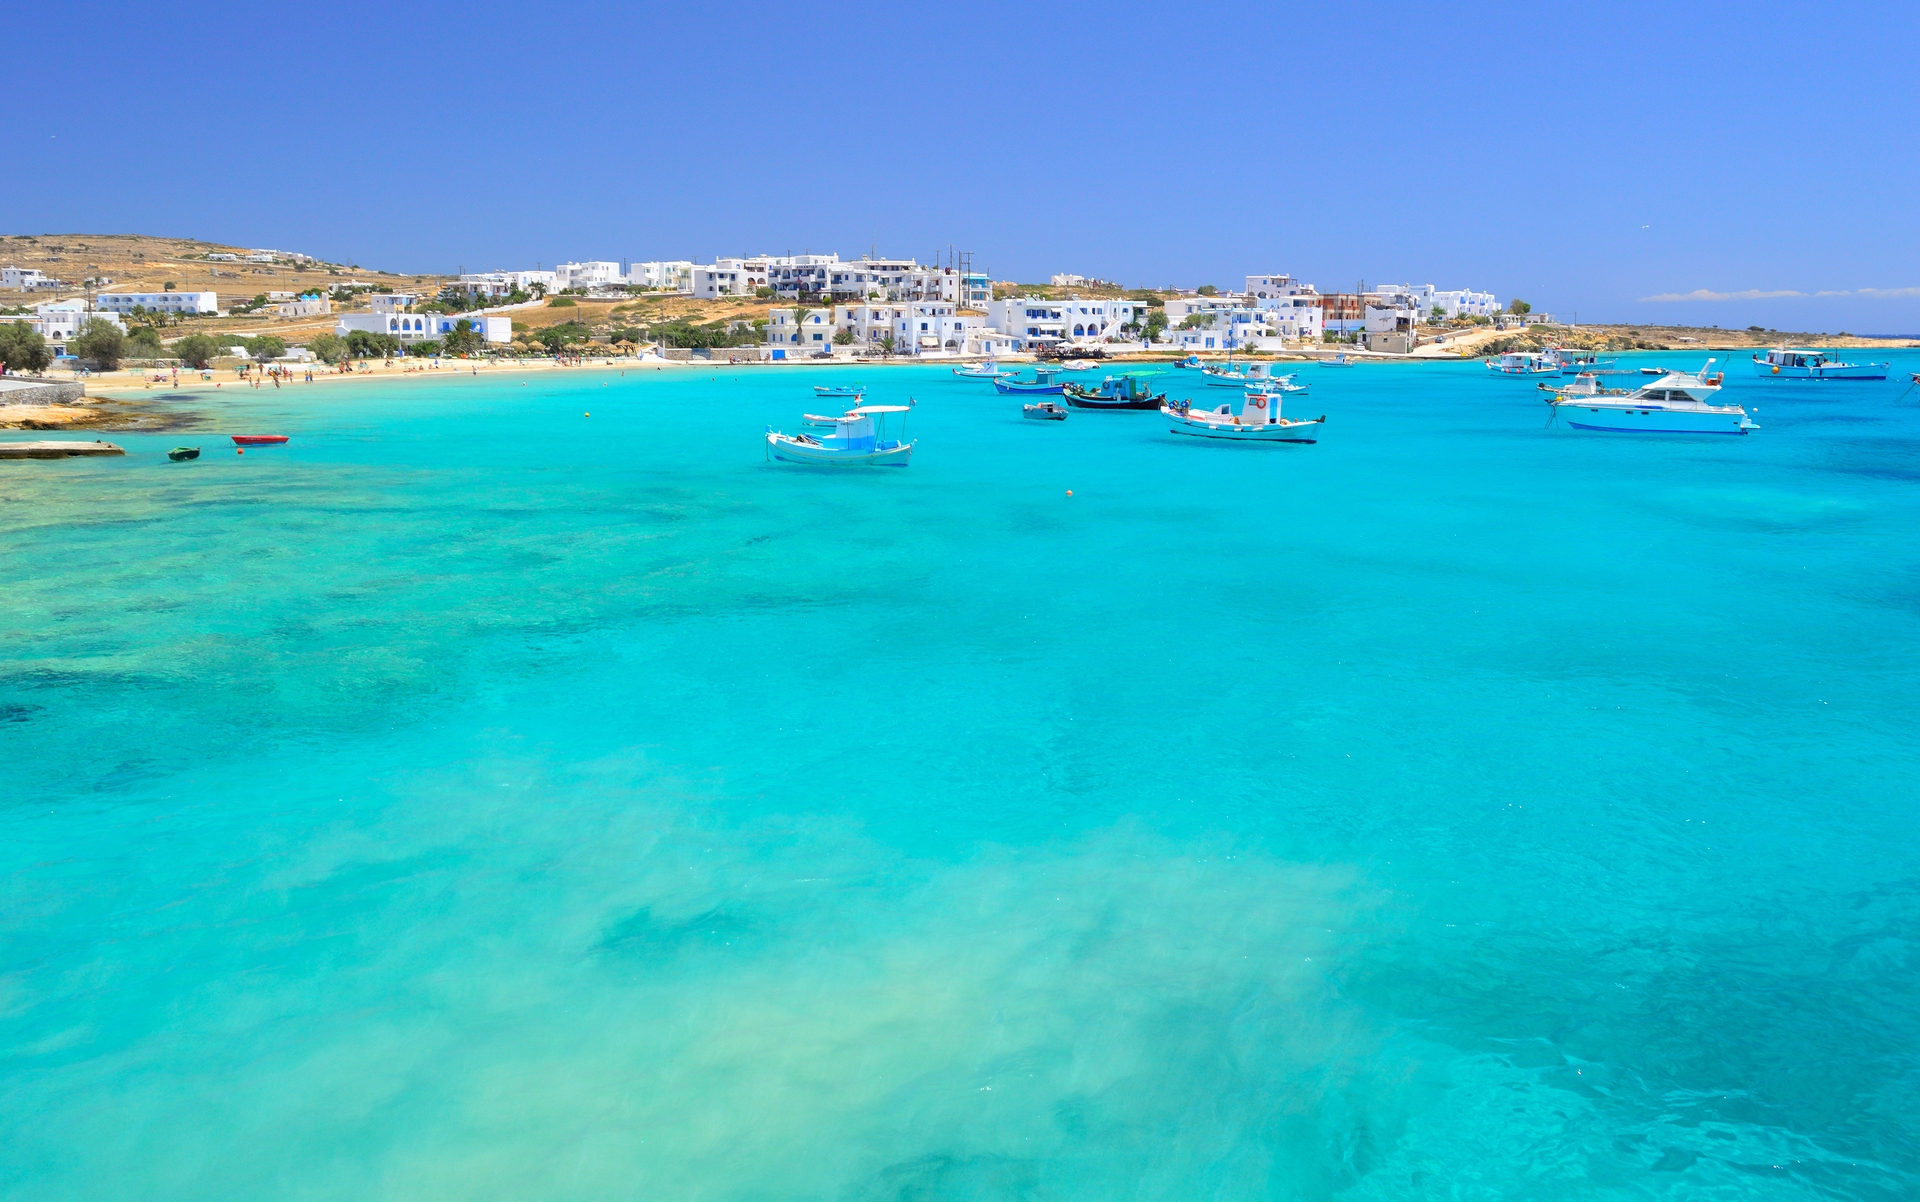 ALLA SCOPERTA DELLE CICLADI estate 2019  Mykonos-Naxos-Koufonissi-Santorini